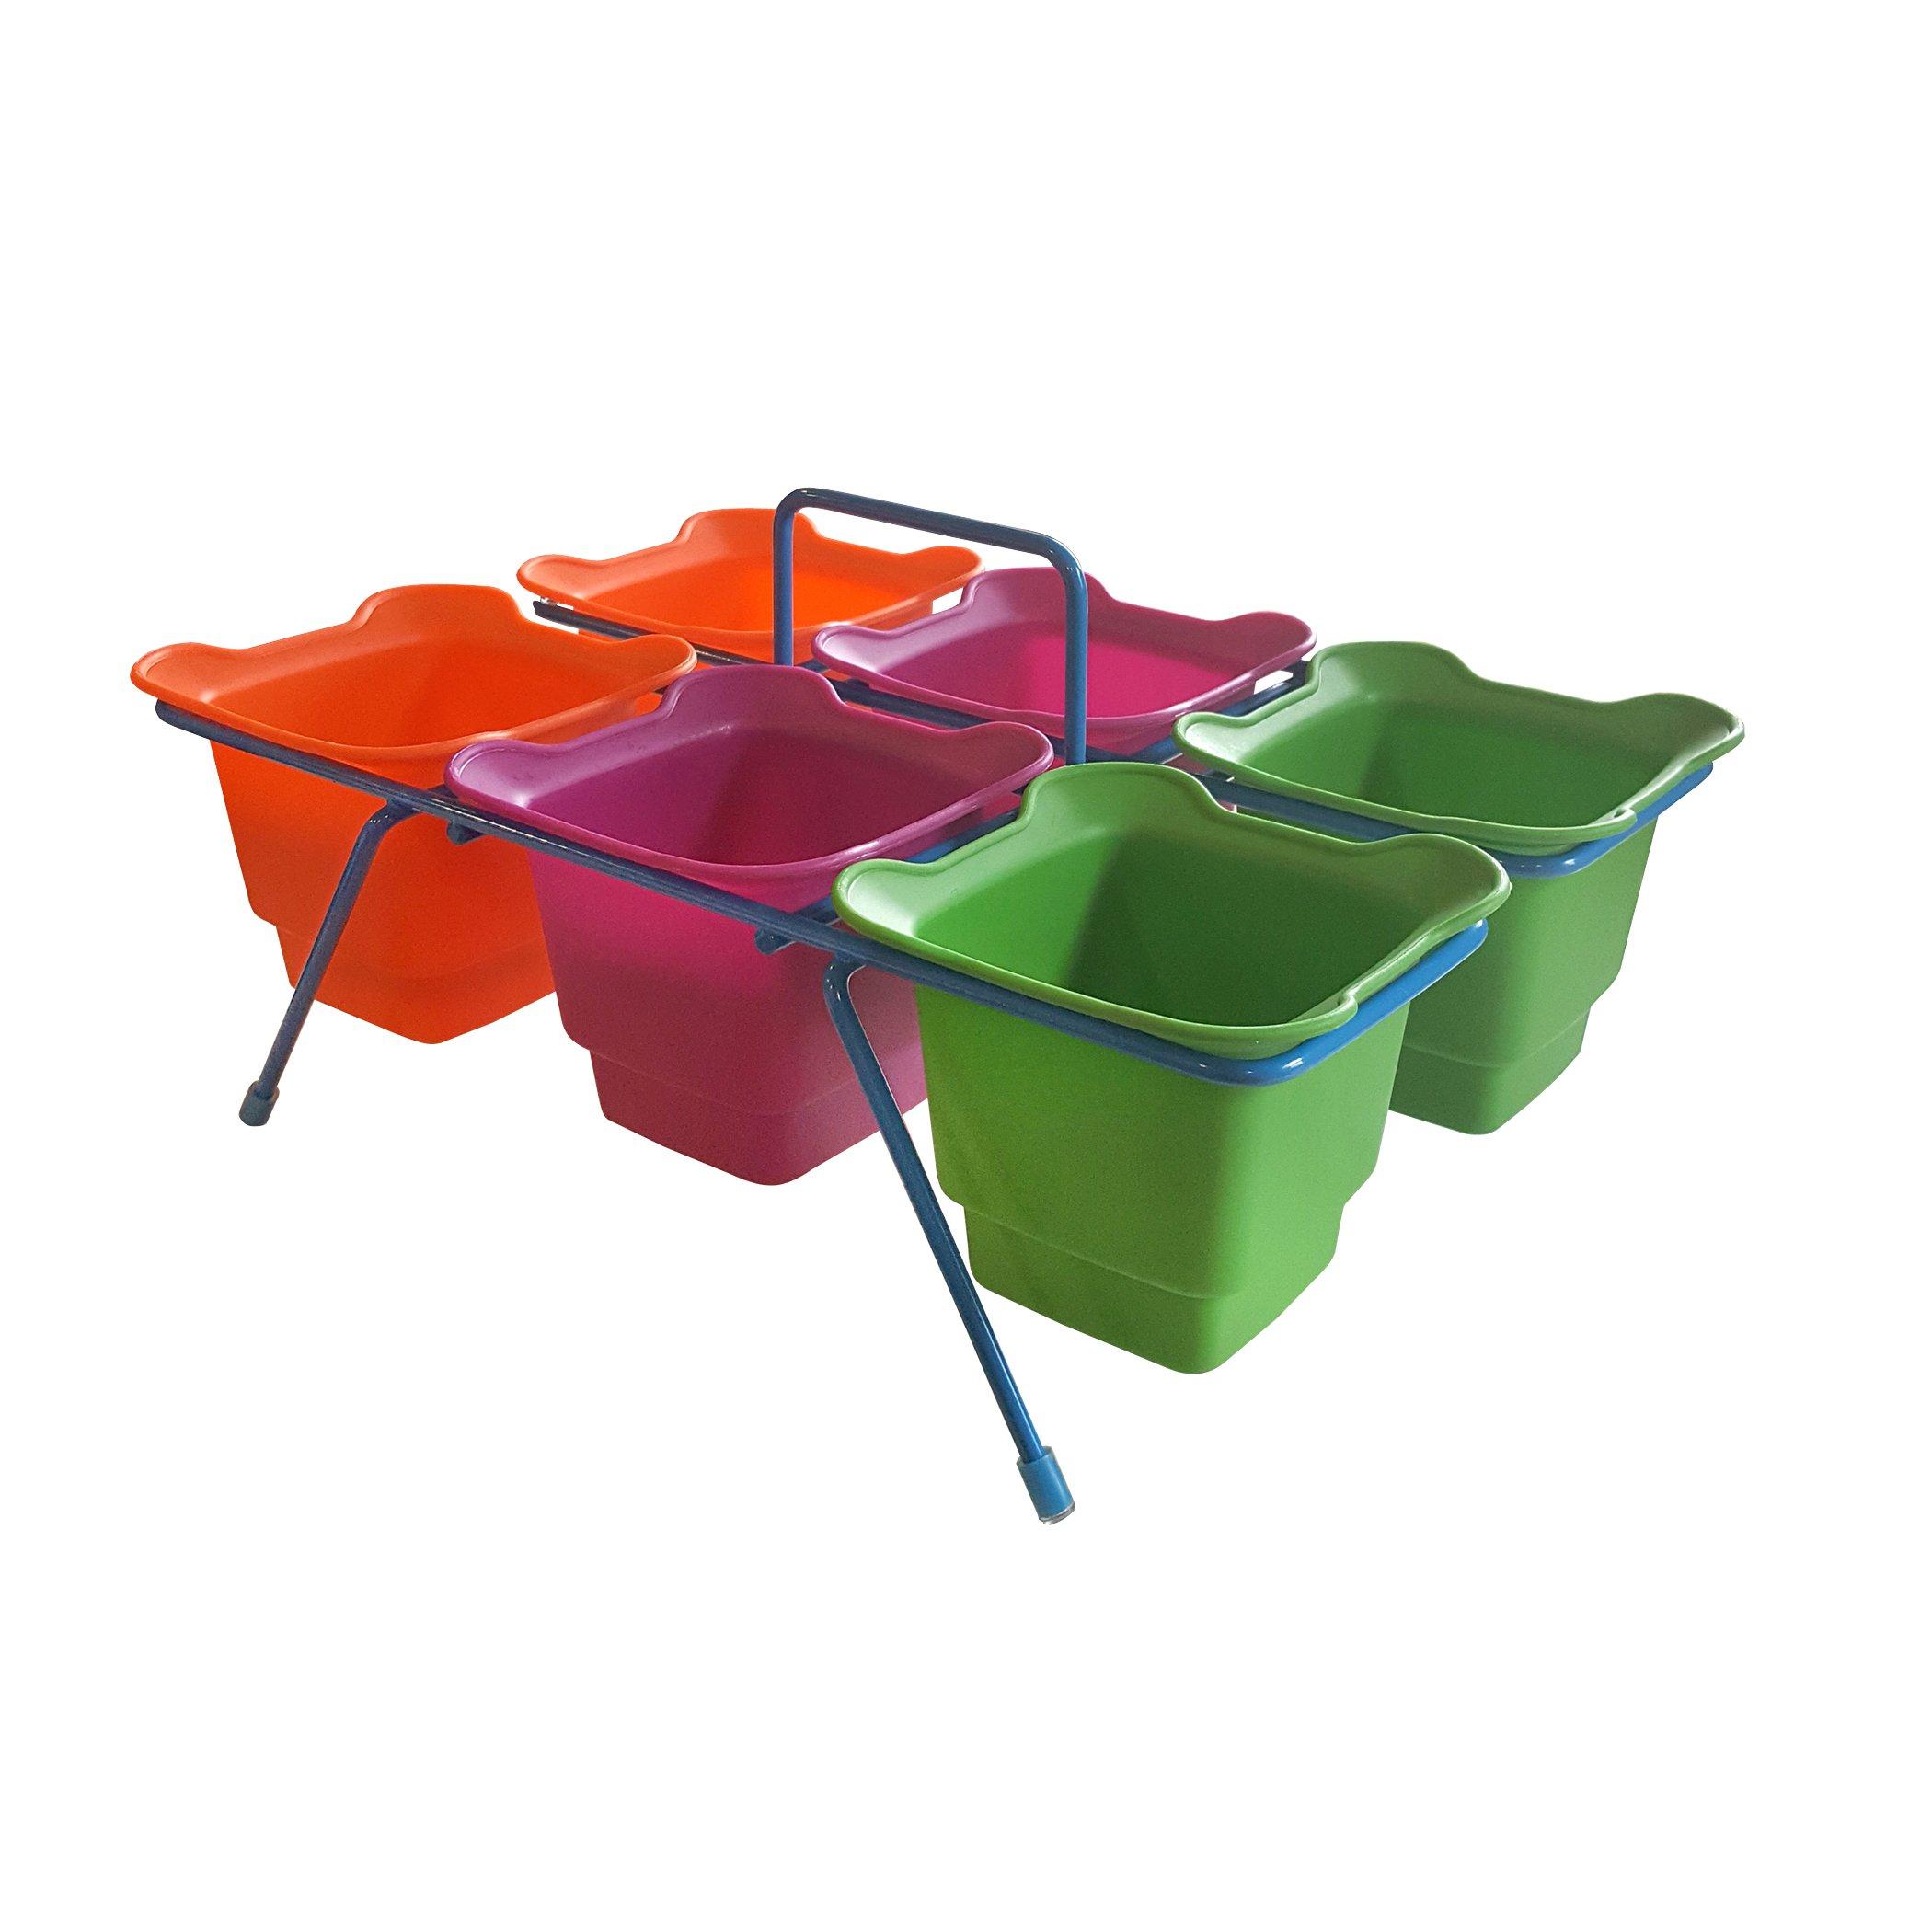 COPERNICUS EDUCATIONAL PROD. CEPTTC1 Tiny Tub Caddy Office Supplies